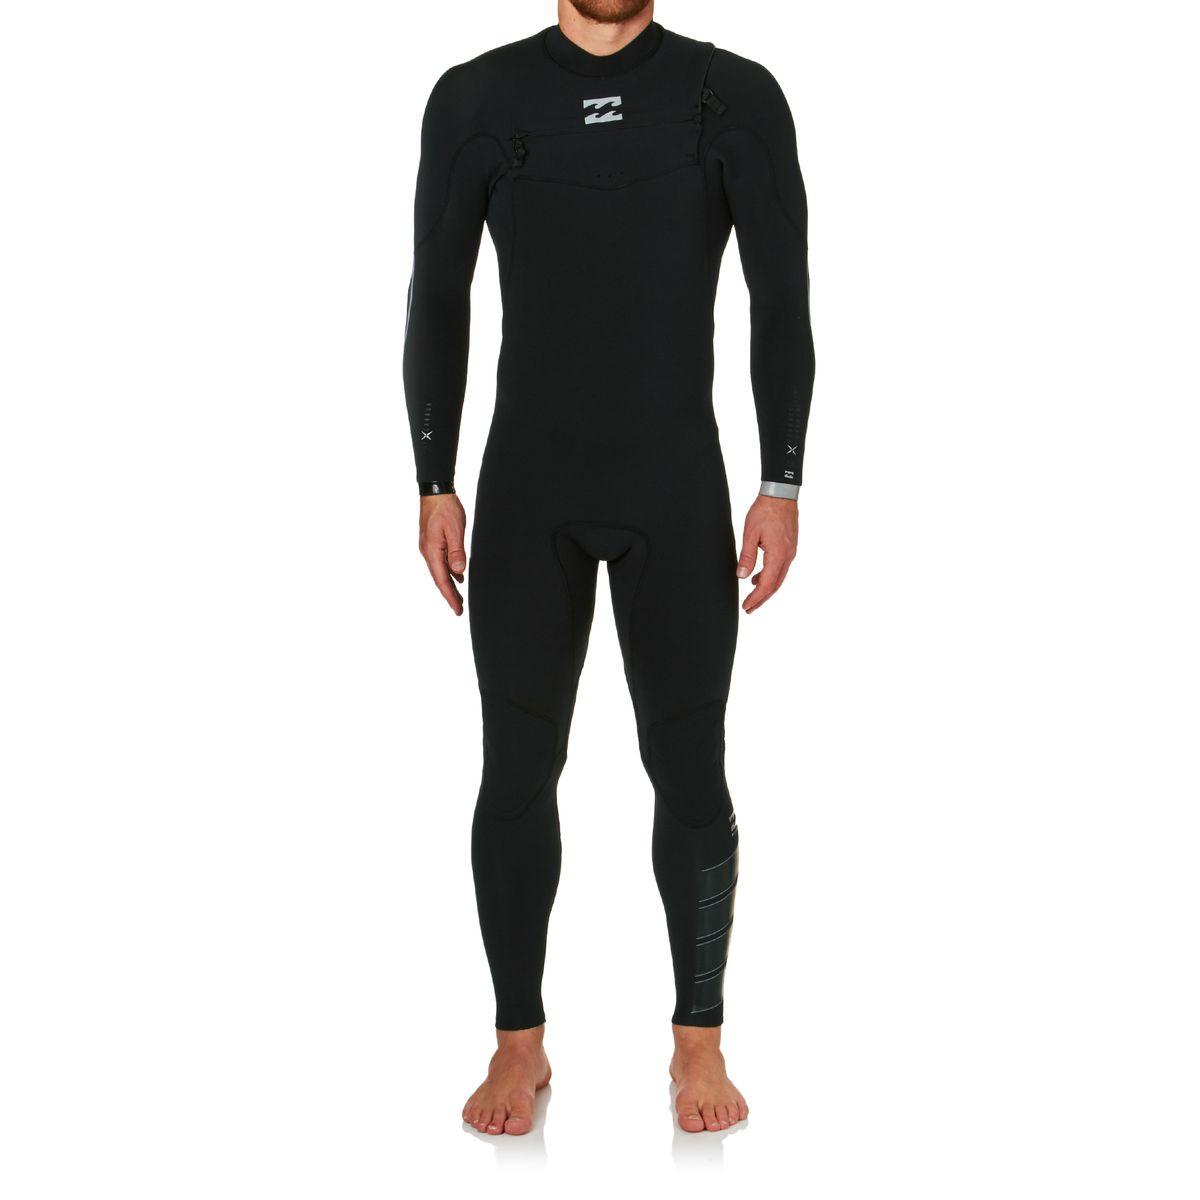 Billabong Furnace Comp 3/2mm Chest Zip Wetsuit - Black